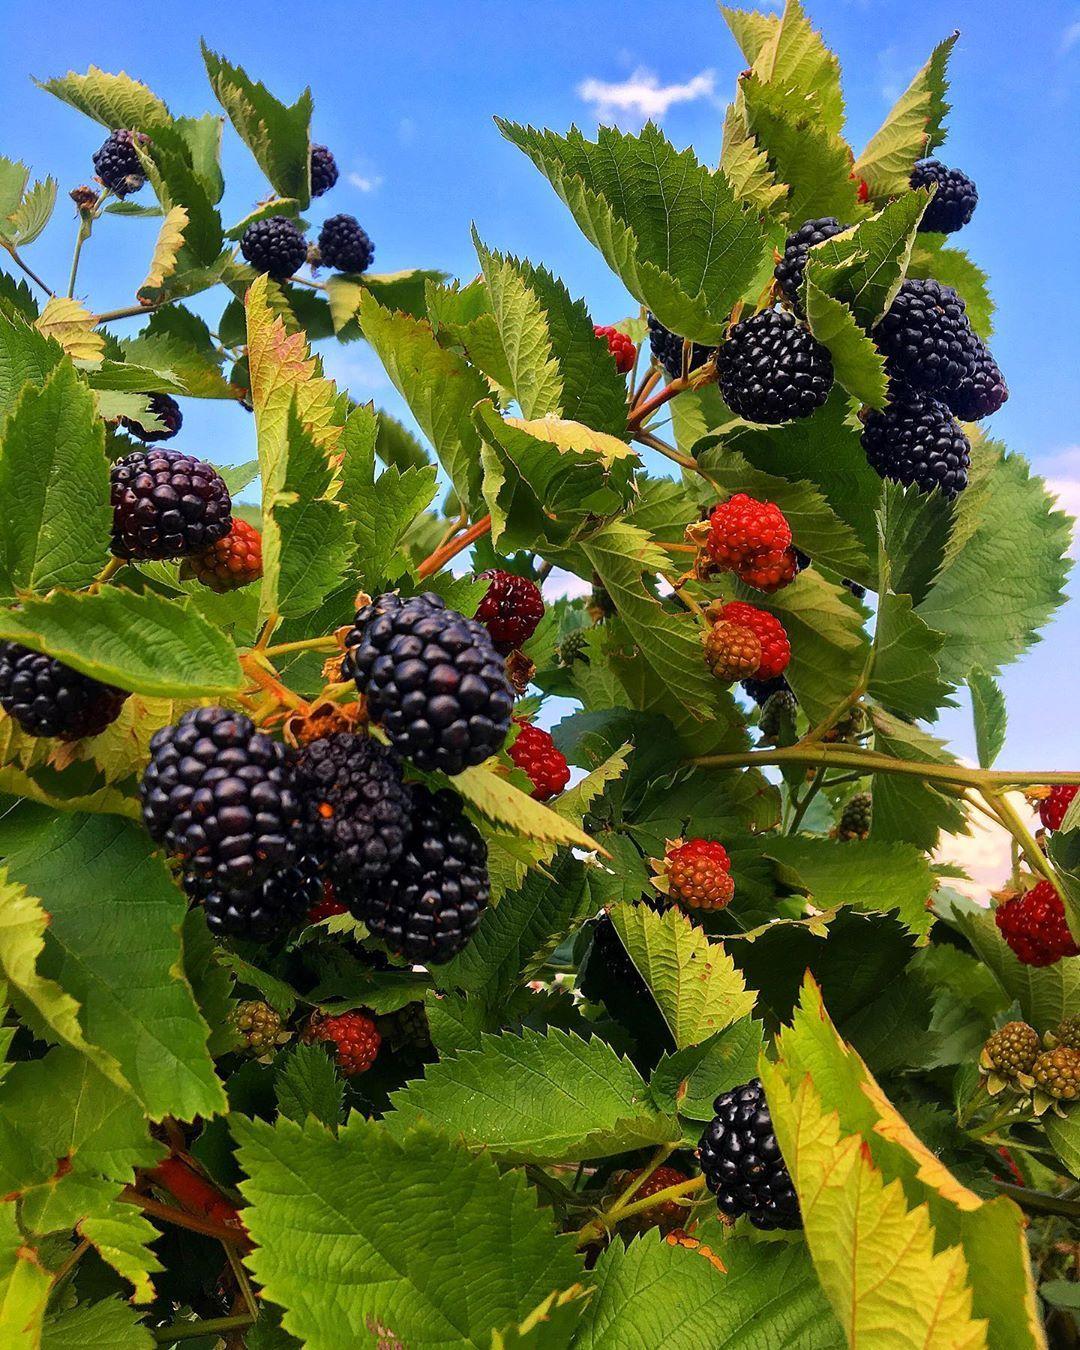 Mure Fructe De Pdure Blackberry Summer Summerfruit Fruit